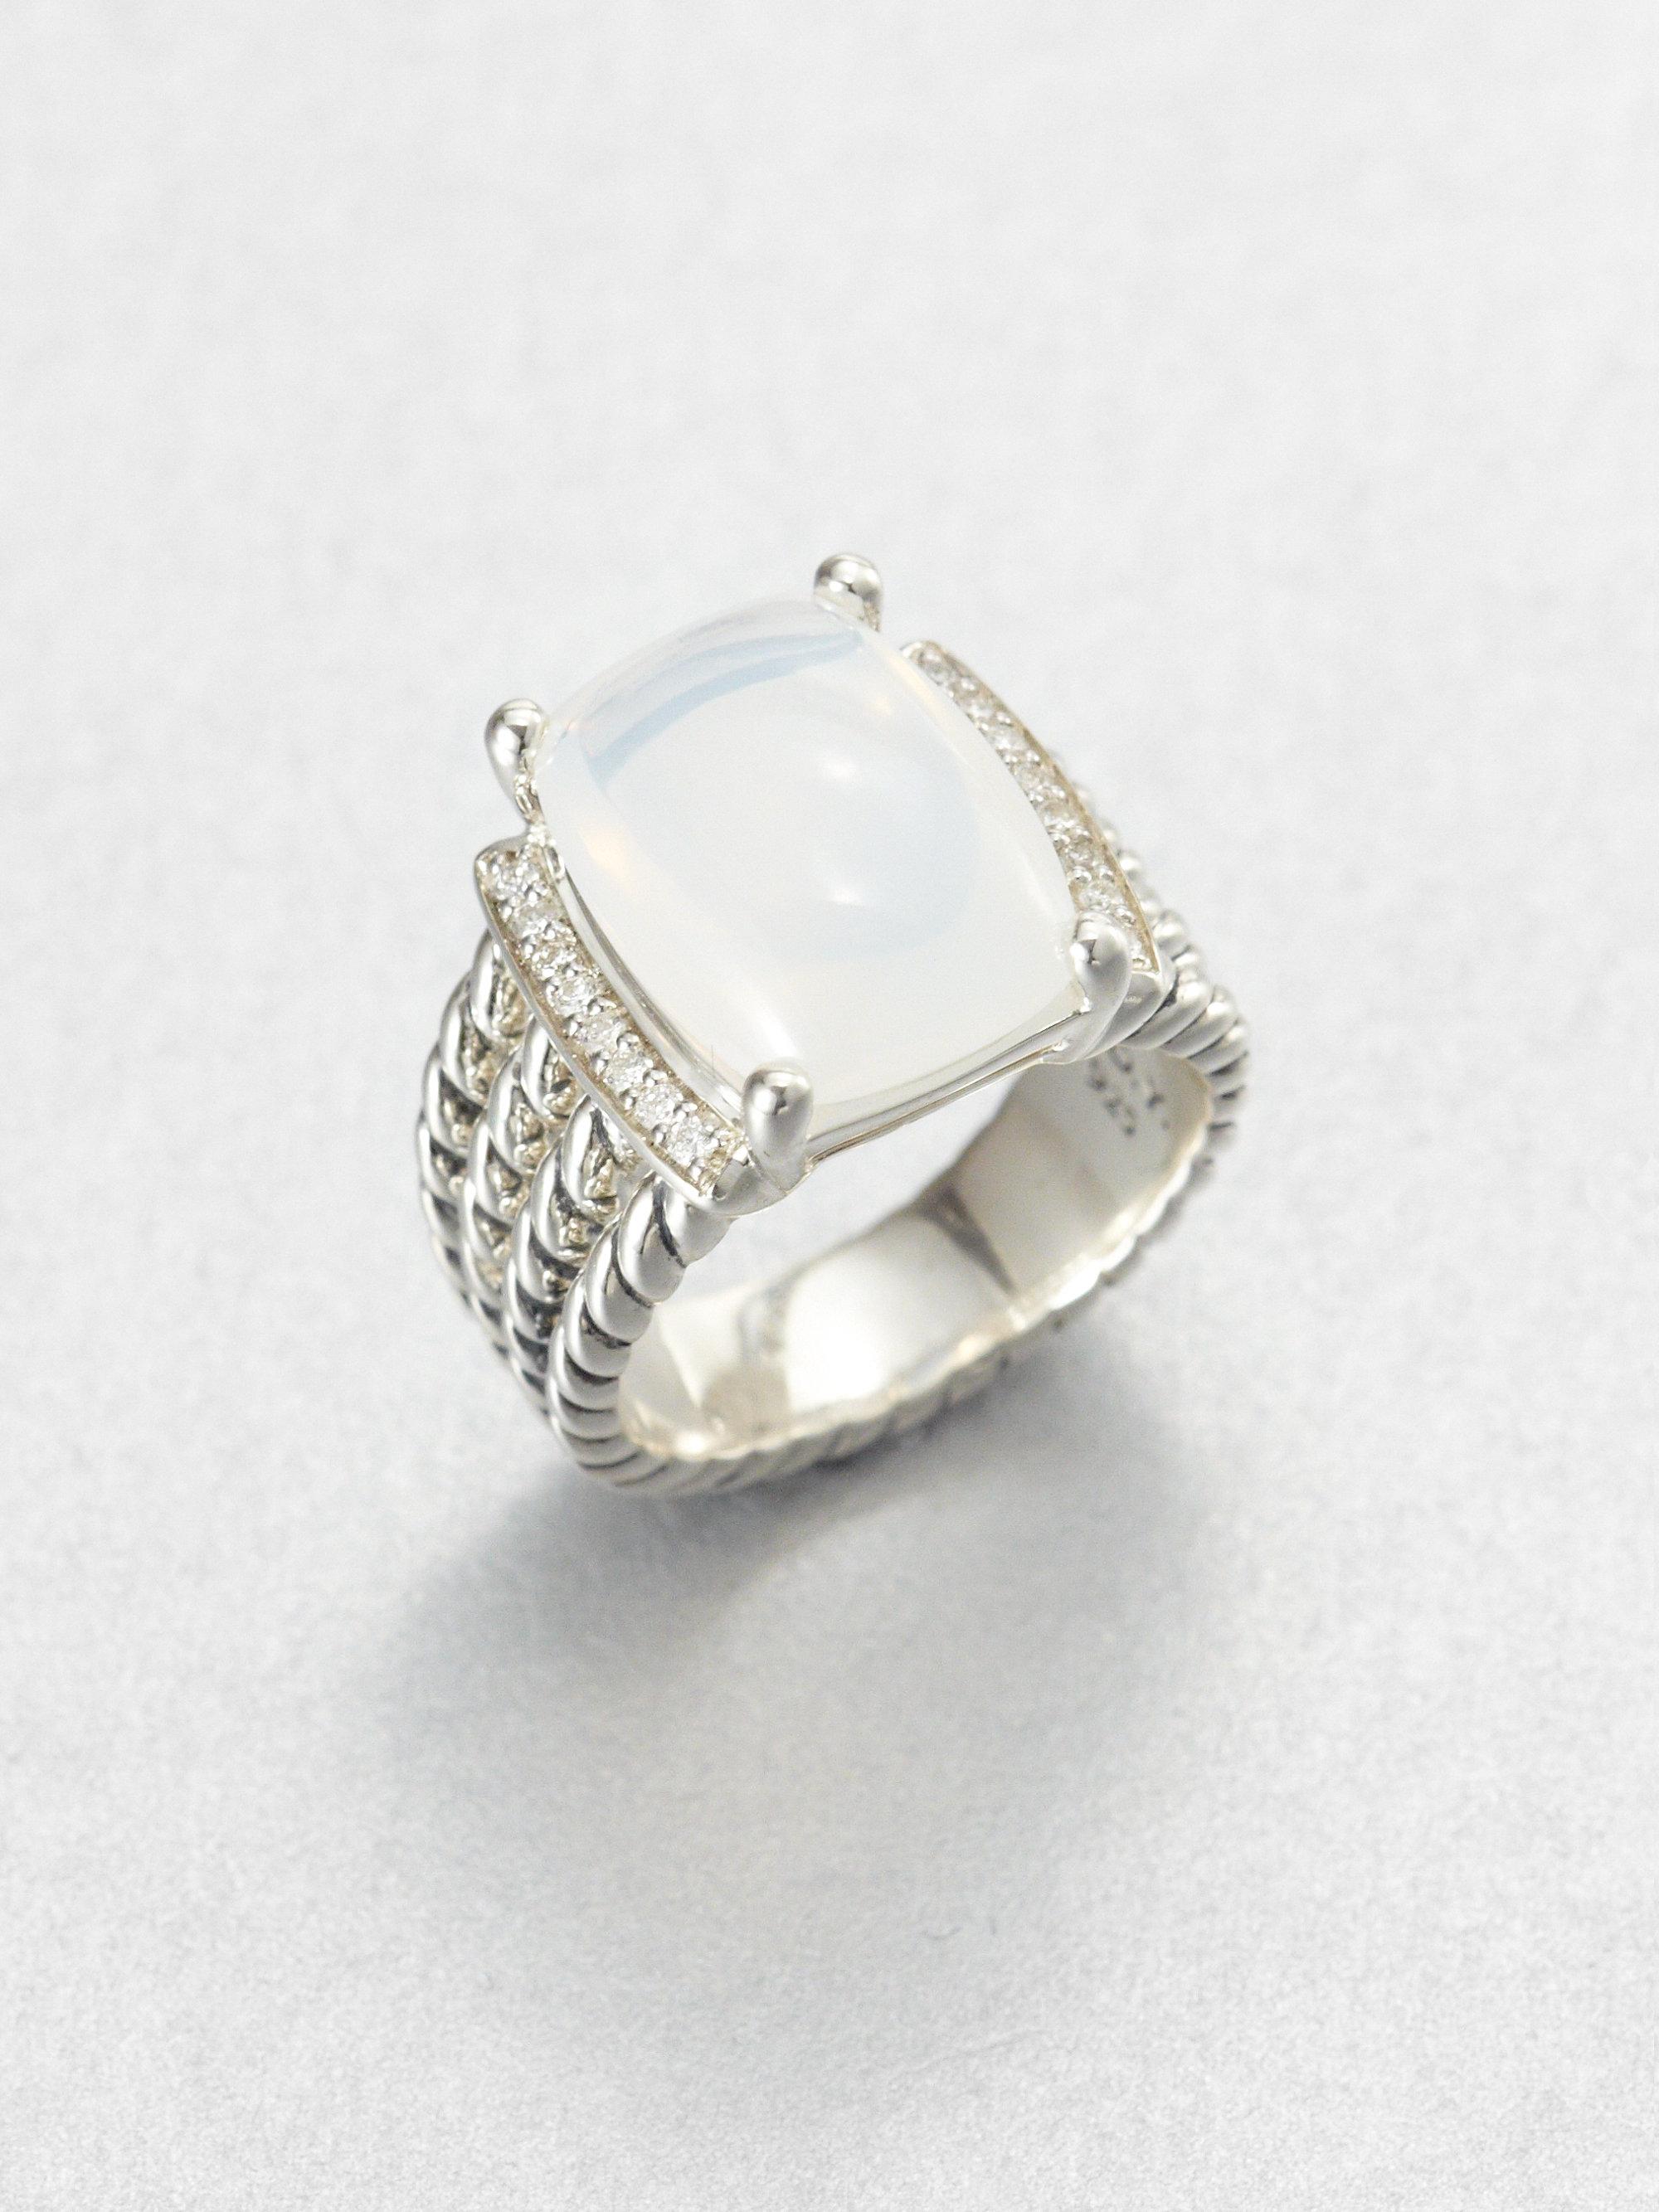 david yurman moon quartz and sterling silver ring